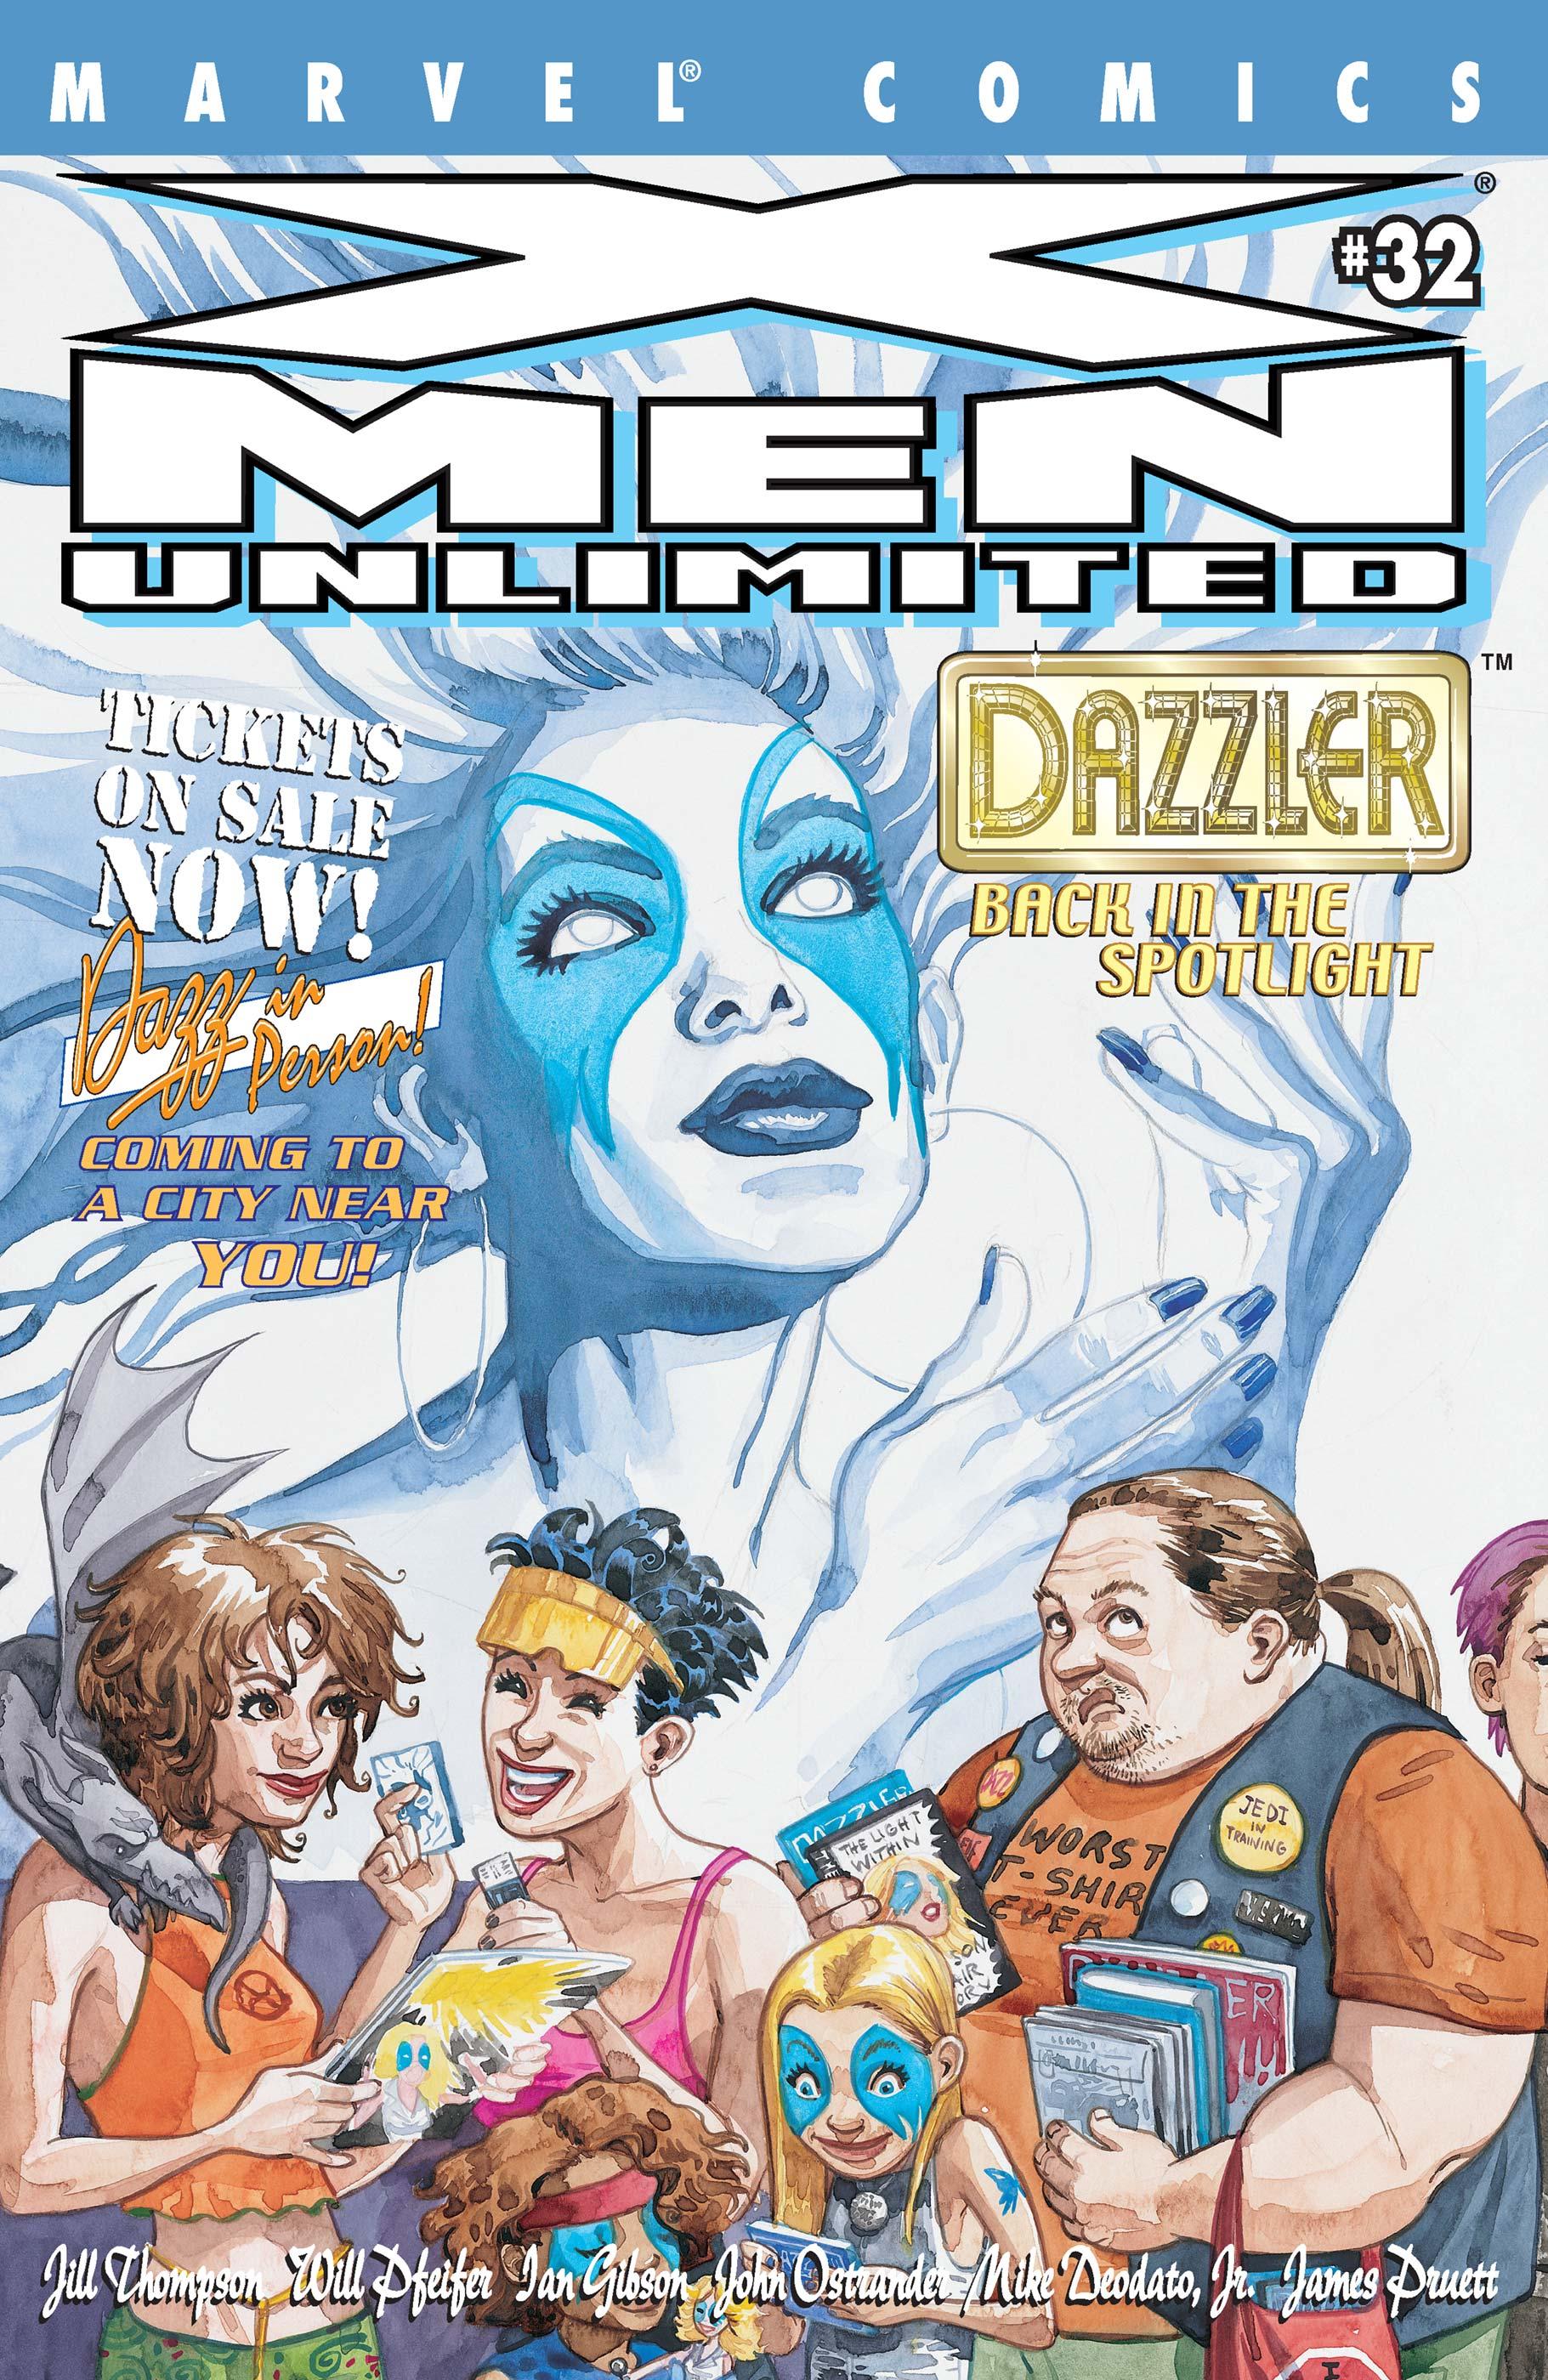 X-Men Unlimited (1993) #32